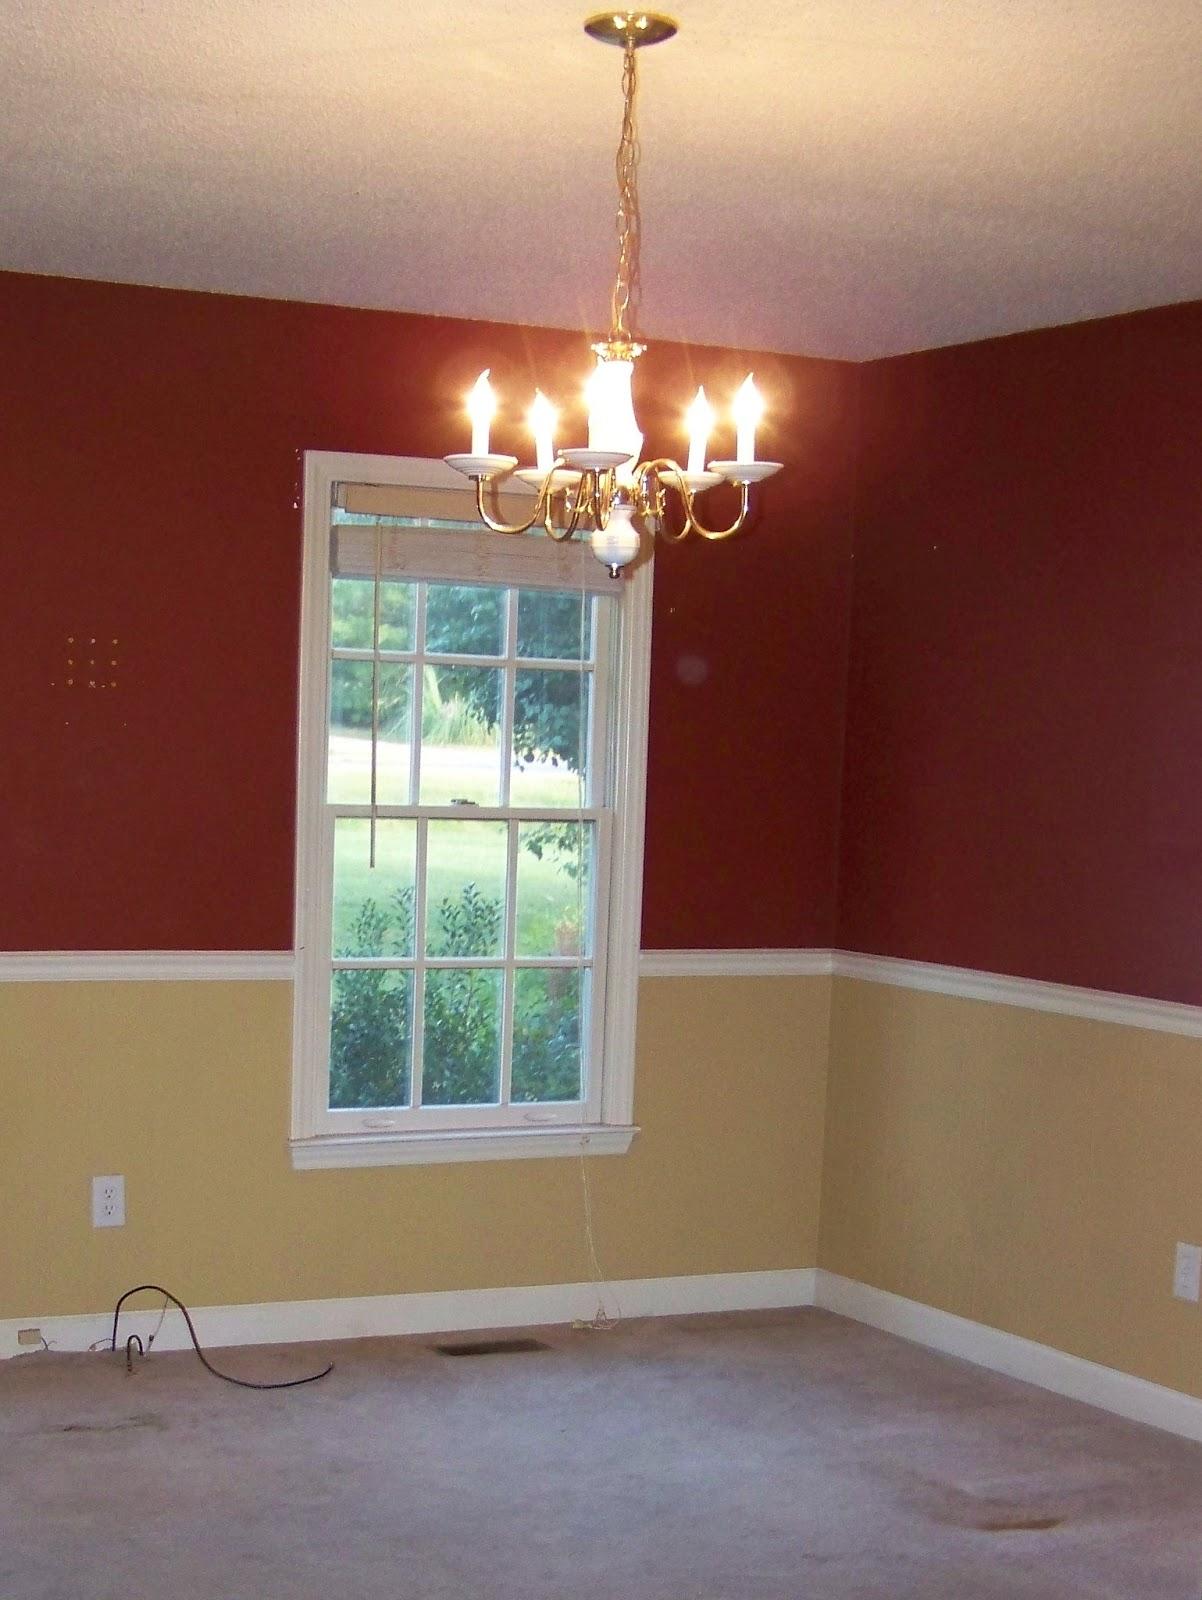 Superieur 10 Photos To Burnt Orange Kitchen Curtains